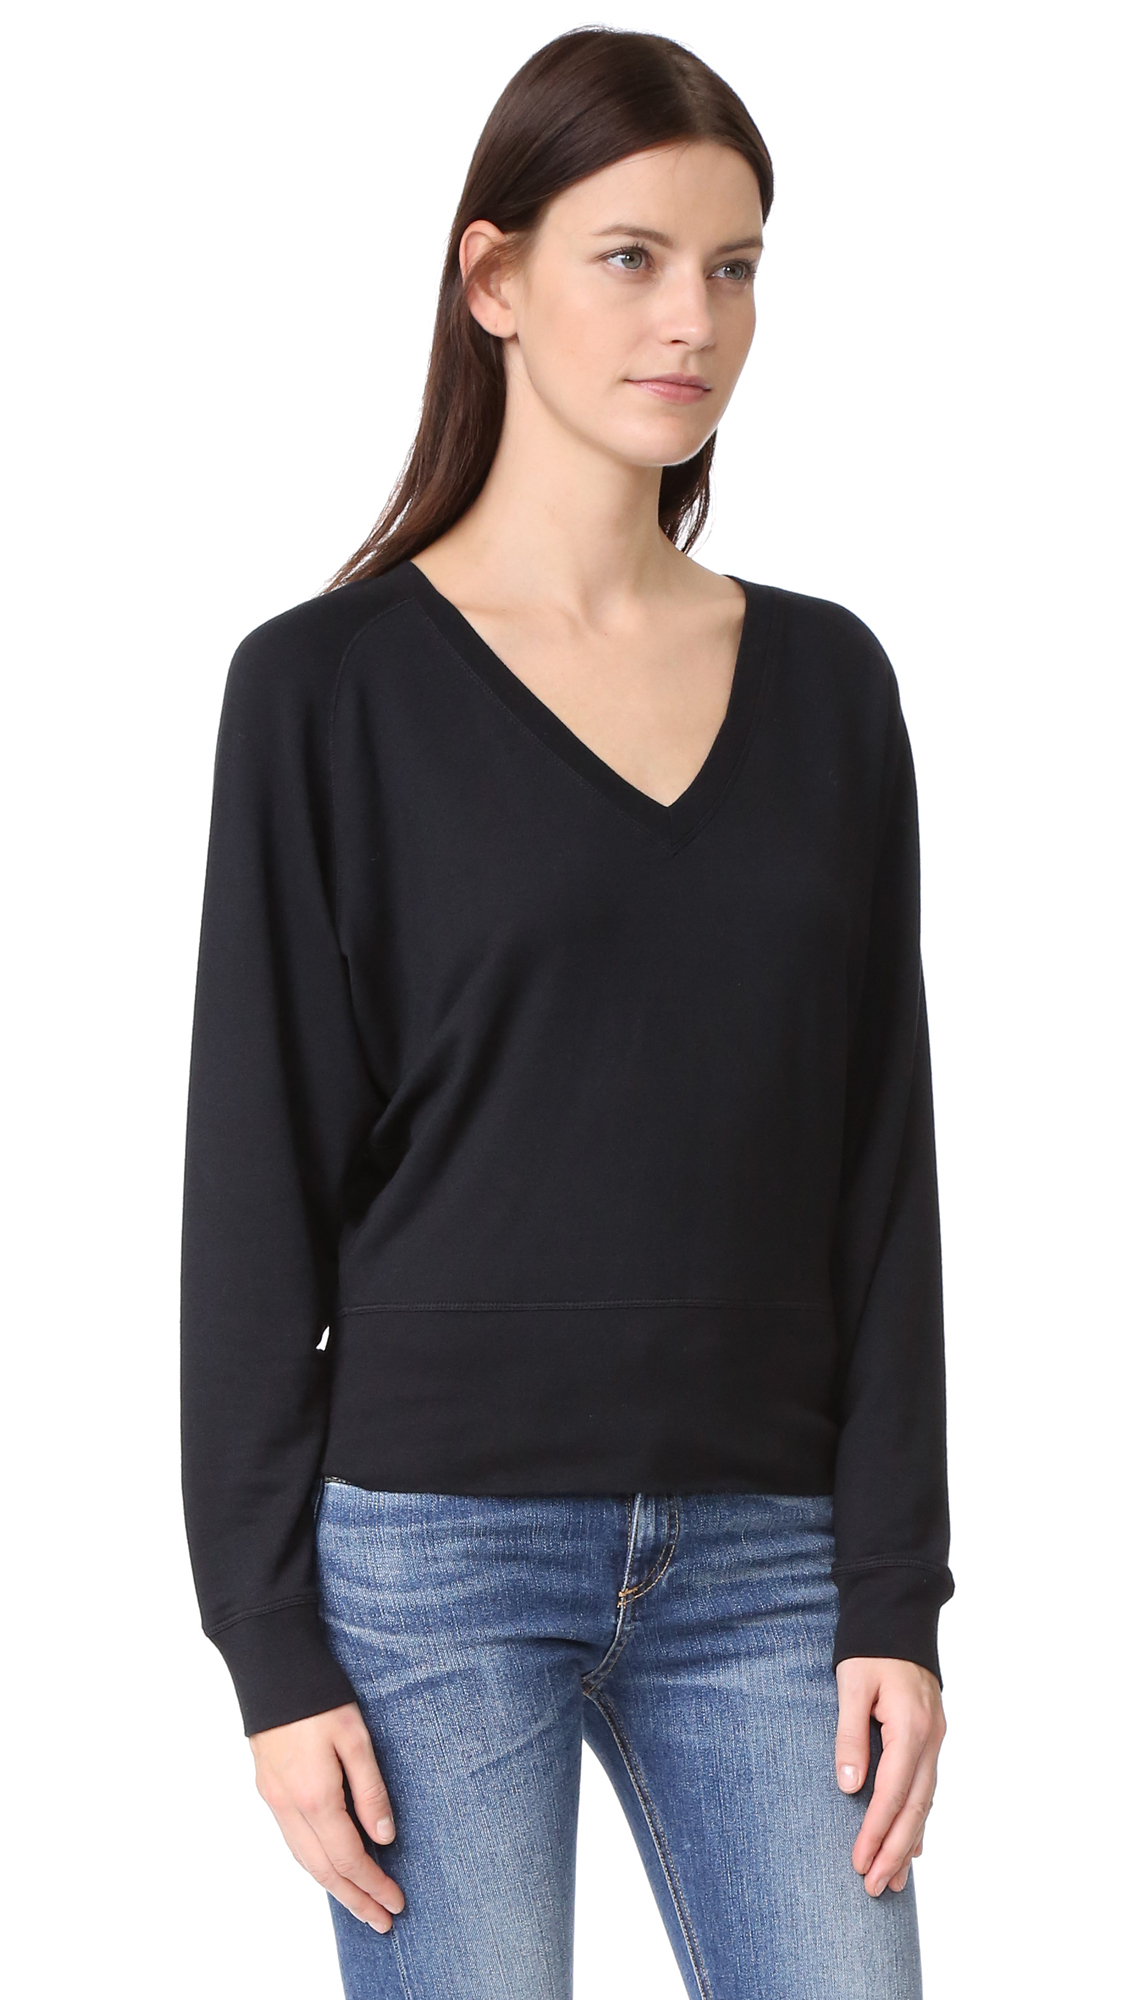 burberry hoodie womens 2013